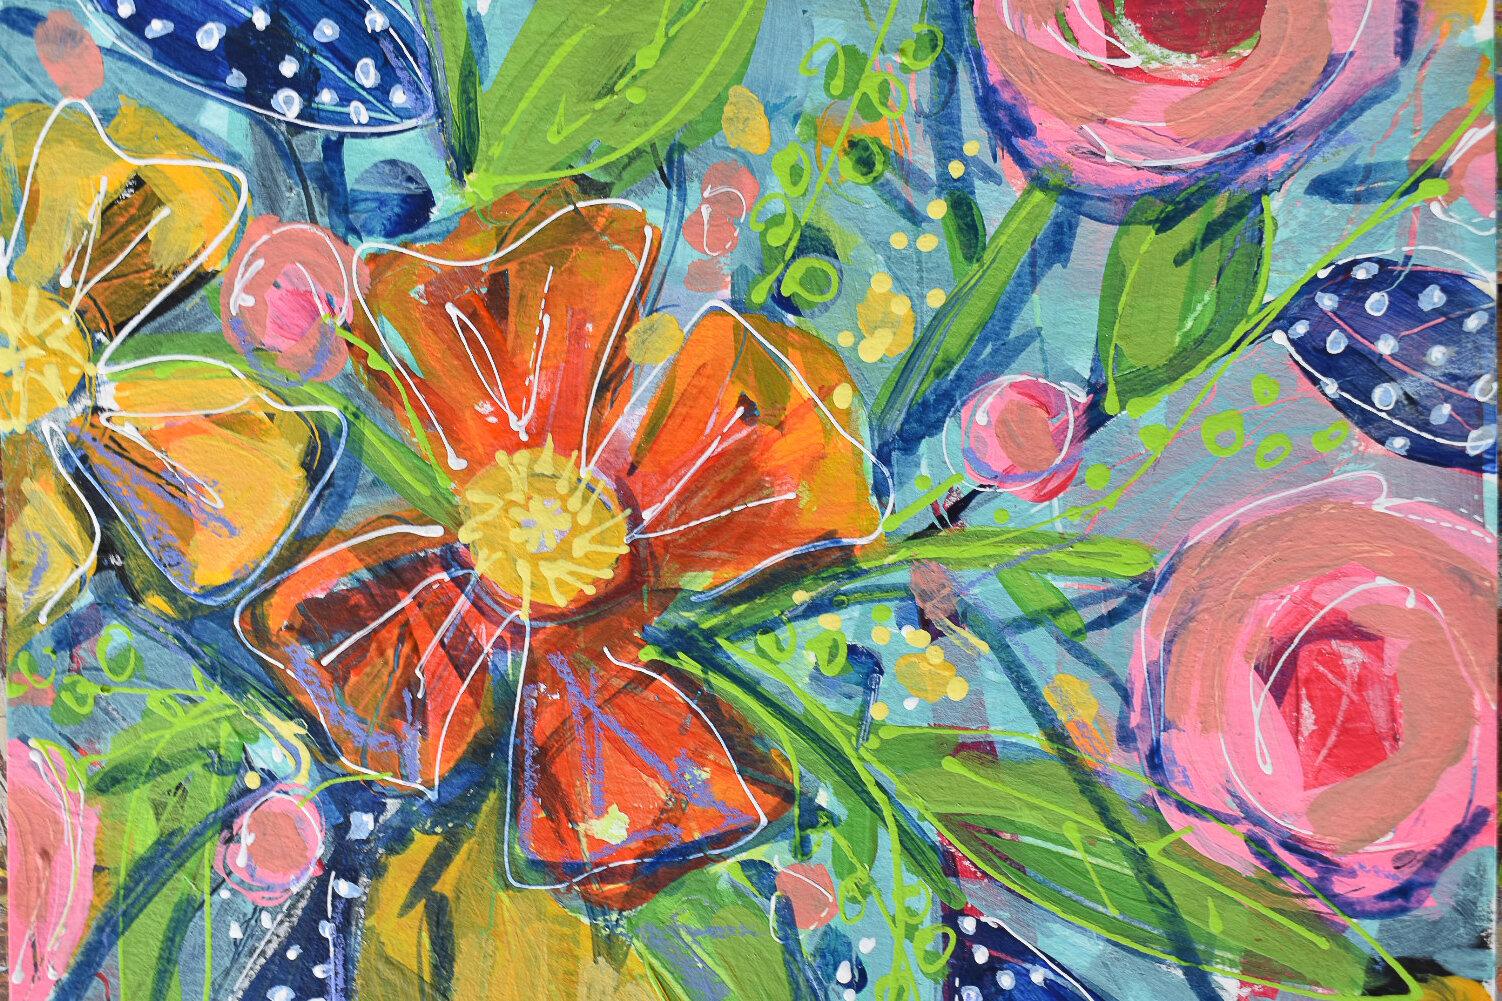 boho_flowers_yellowvase_daisyfaithart6.jpg